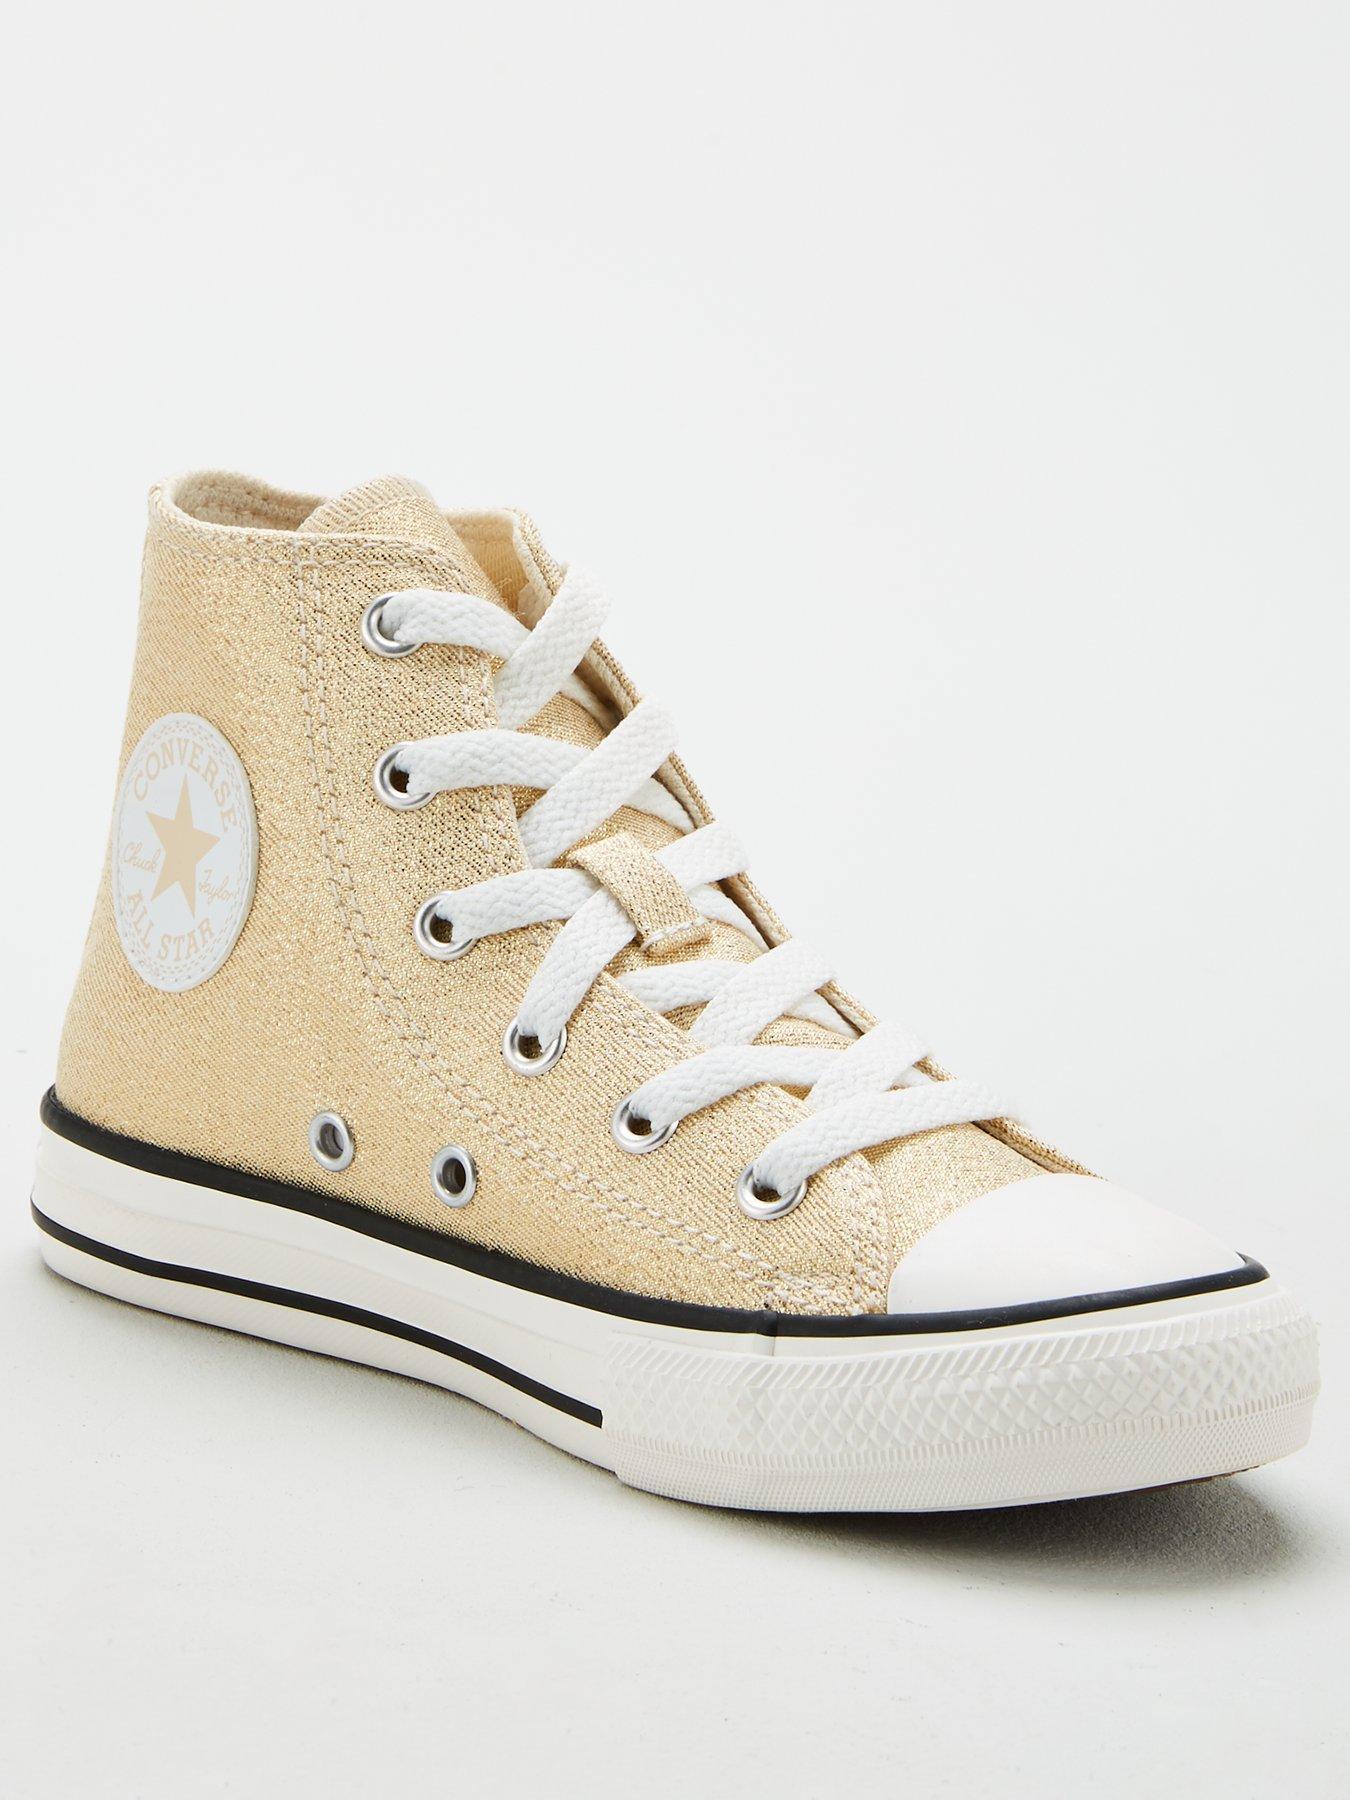 Converse Chuck Taylor All Star Street Slip Fashion Sneakers Black//Vintage Khaki Size 2.5 Little Kid